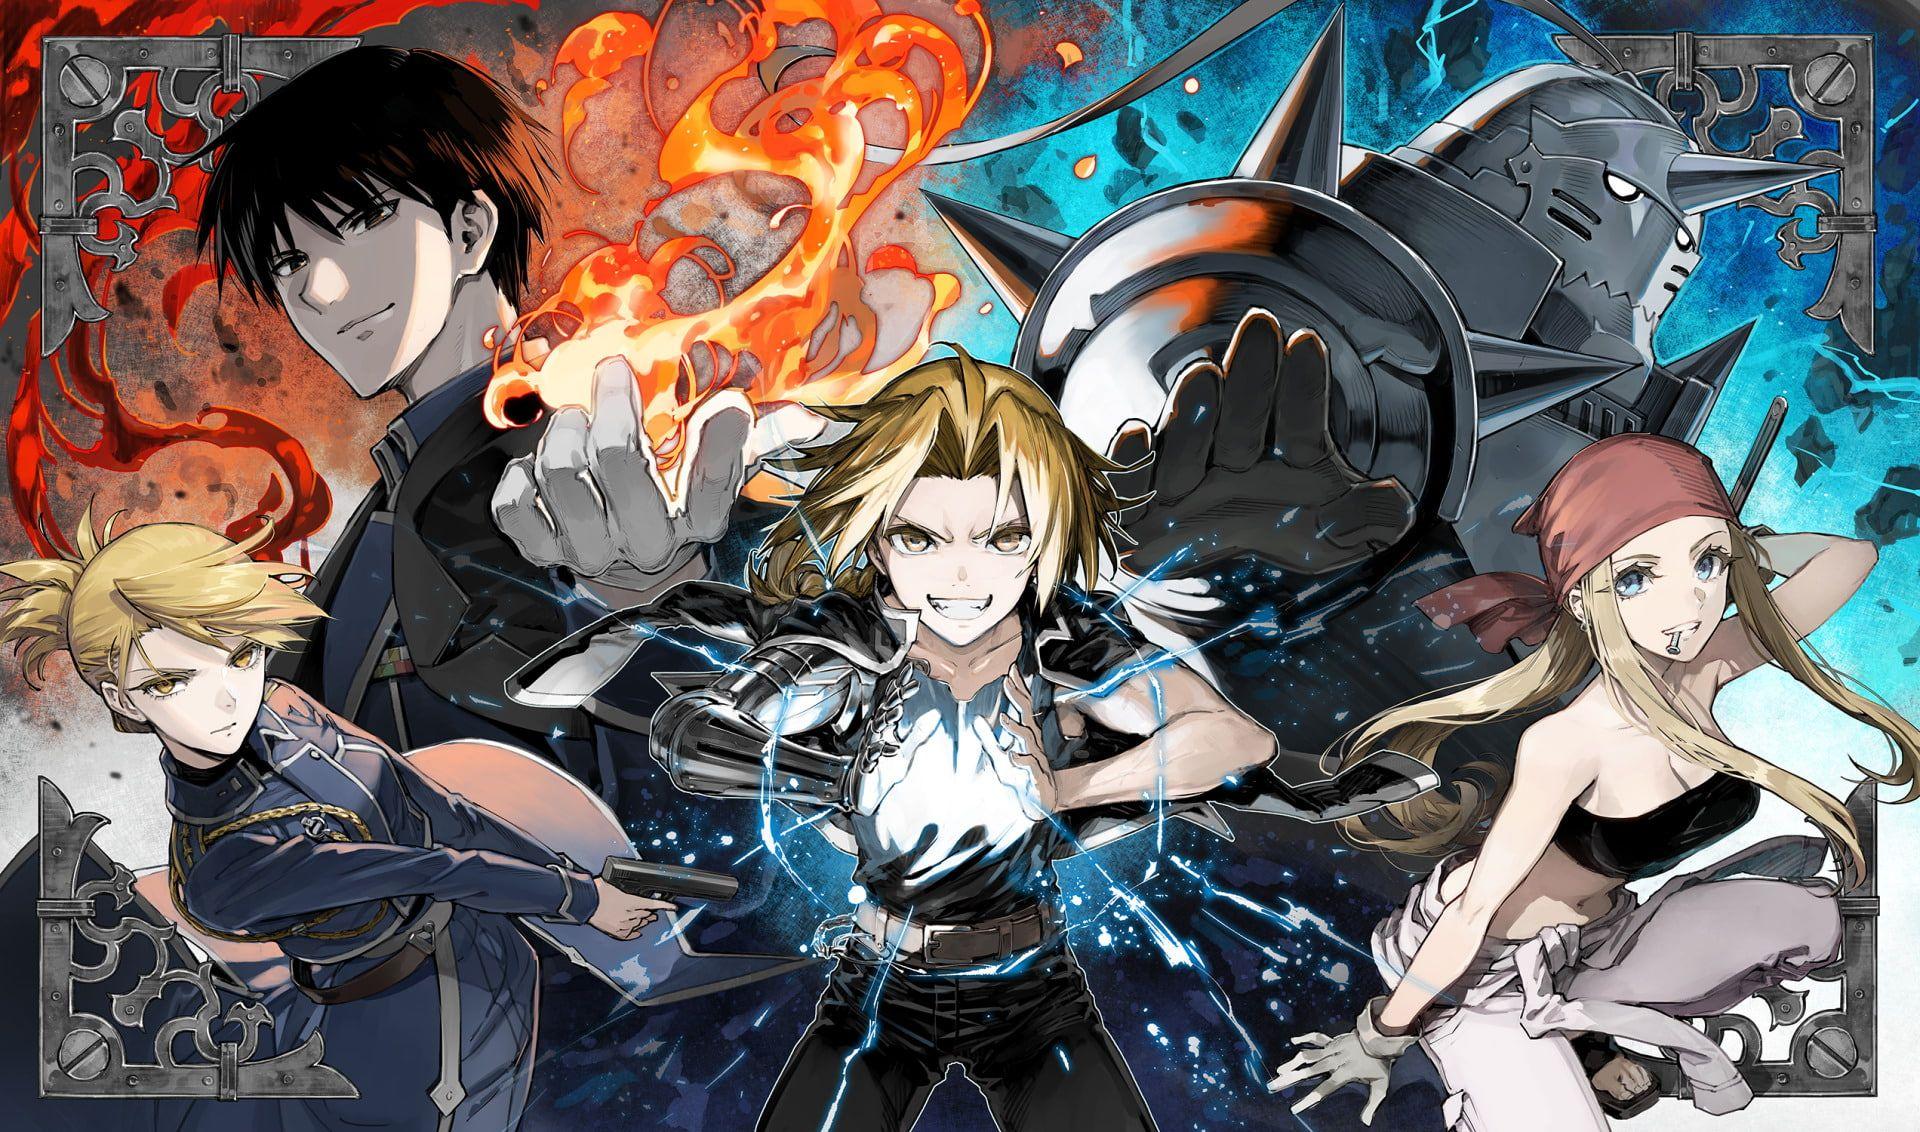 Fullmetal Alchemist Fullmetal Alchemist Edward Elric Riza Hawkeye Roy Mustang Winry Rockbell 1080p Fullmetal Alchemist Fullmetal Alchemist Brotherhood Anime